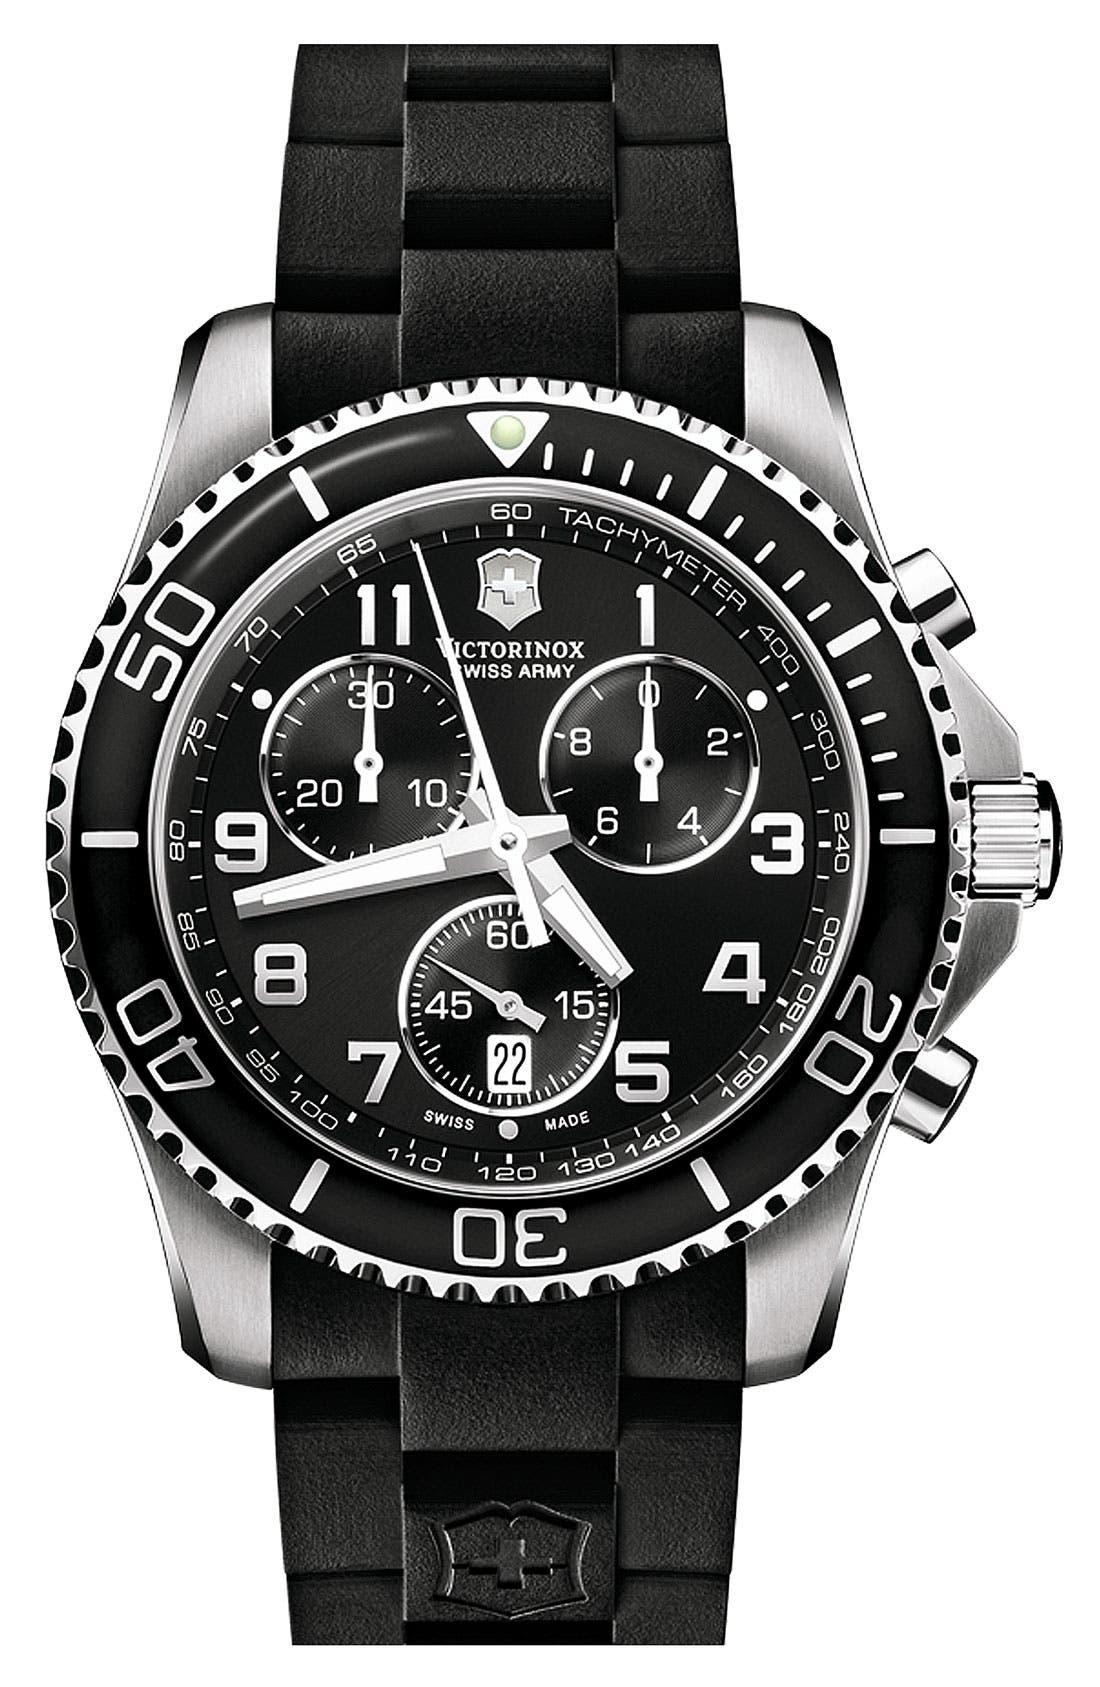 Alternate Image 1 Selected - Victorinox Swiss Army® 'Maverick GS' Rubber Strap Chronograph Watch, 43mm